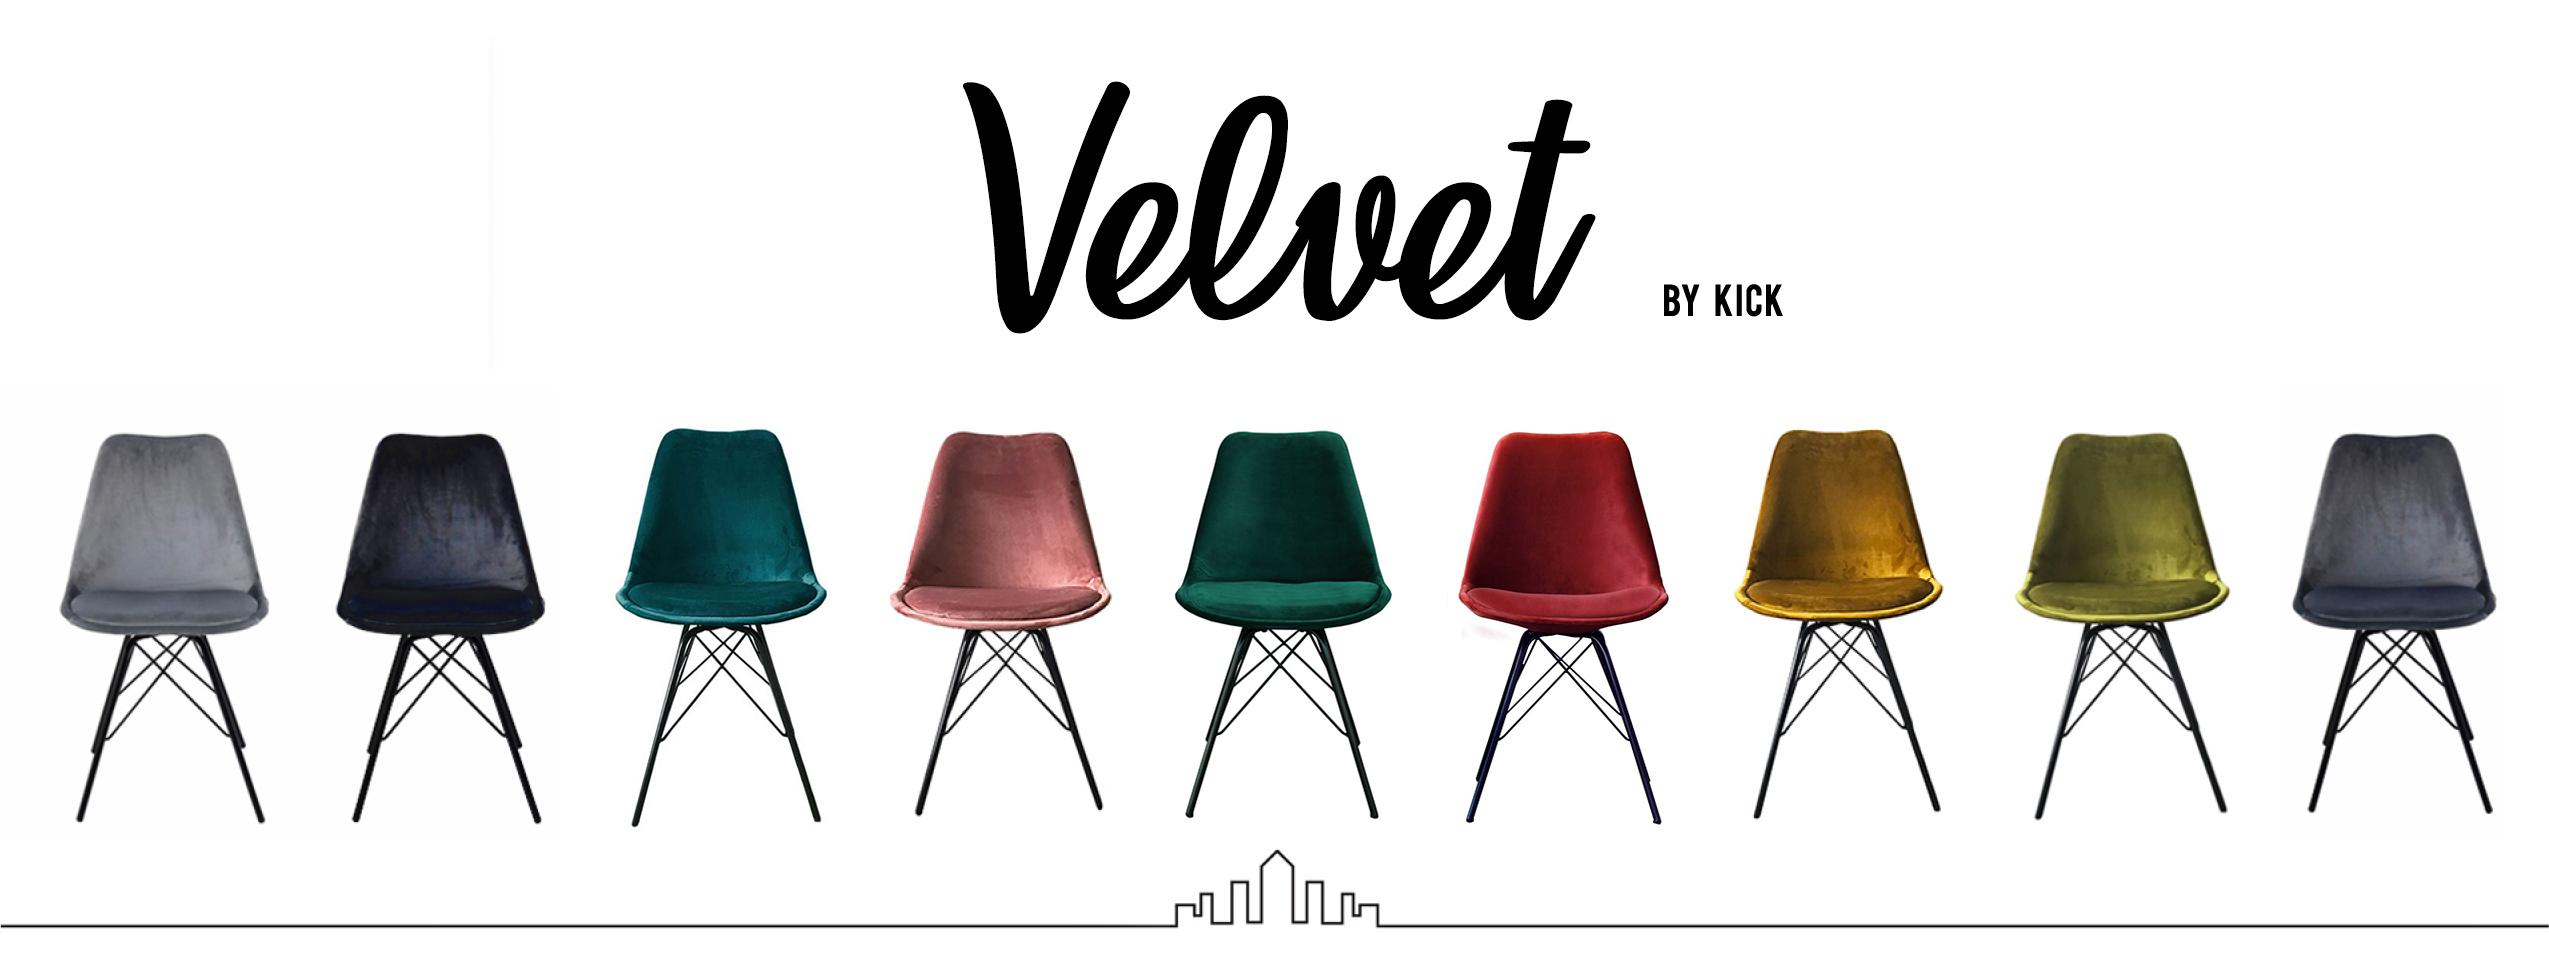 Kick - Velvet Kuipstoelen - 11 kleuren